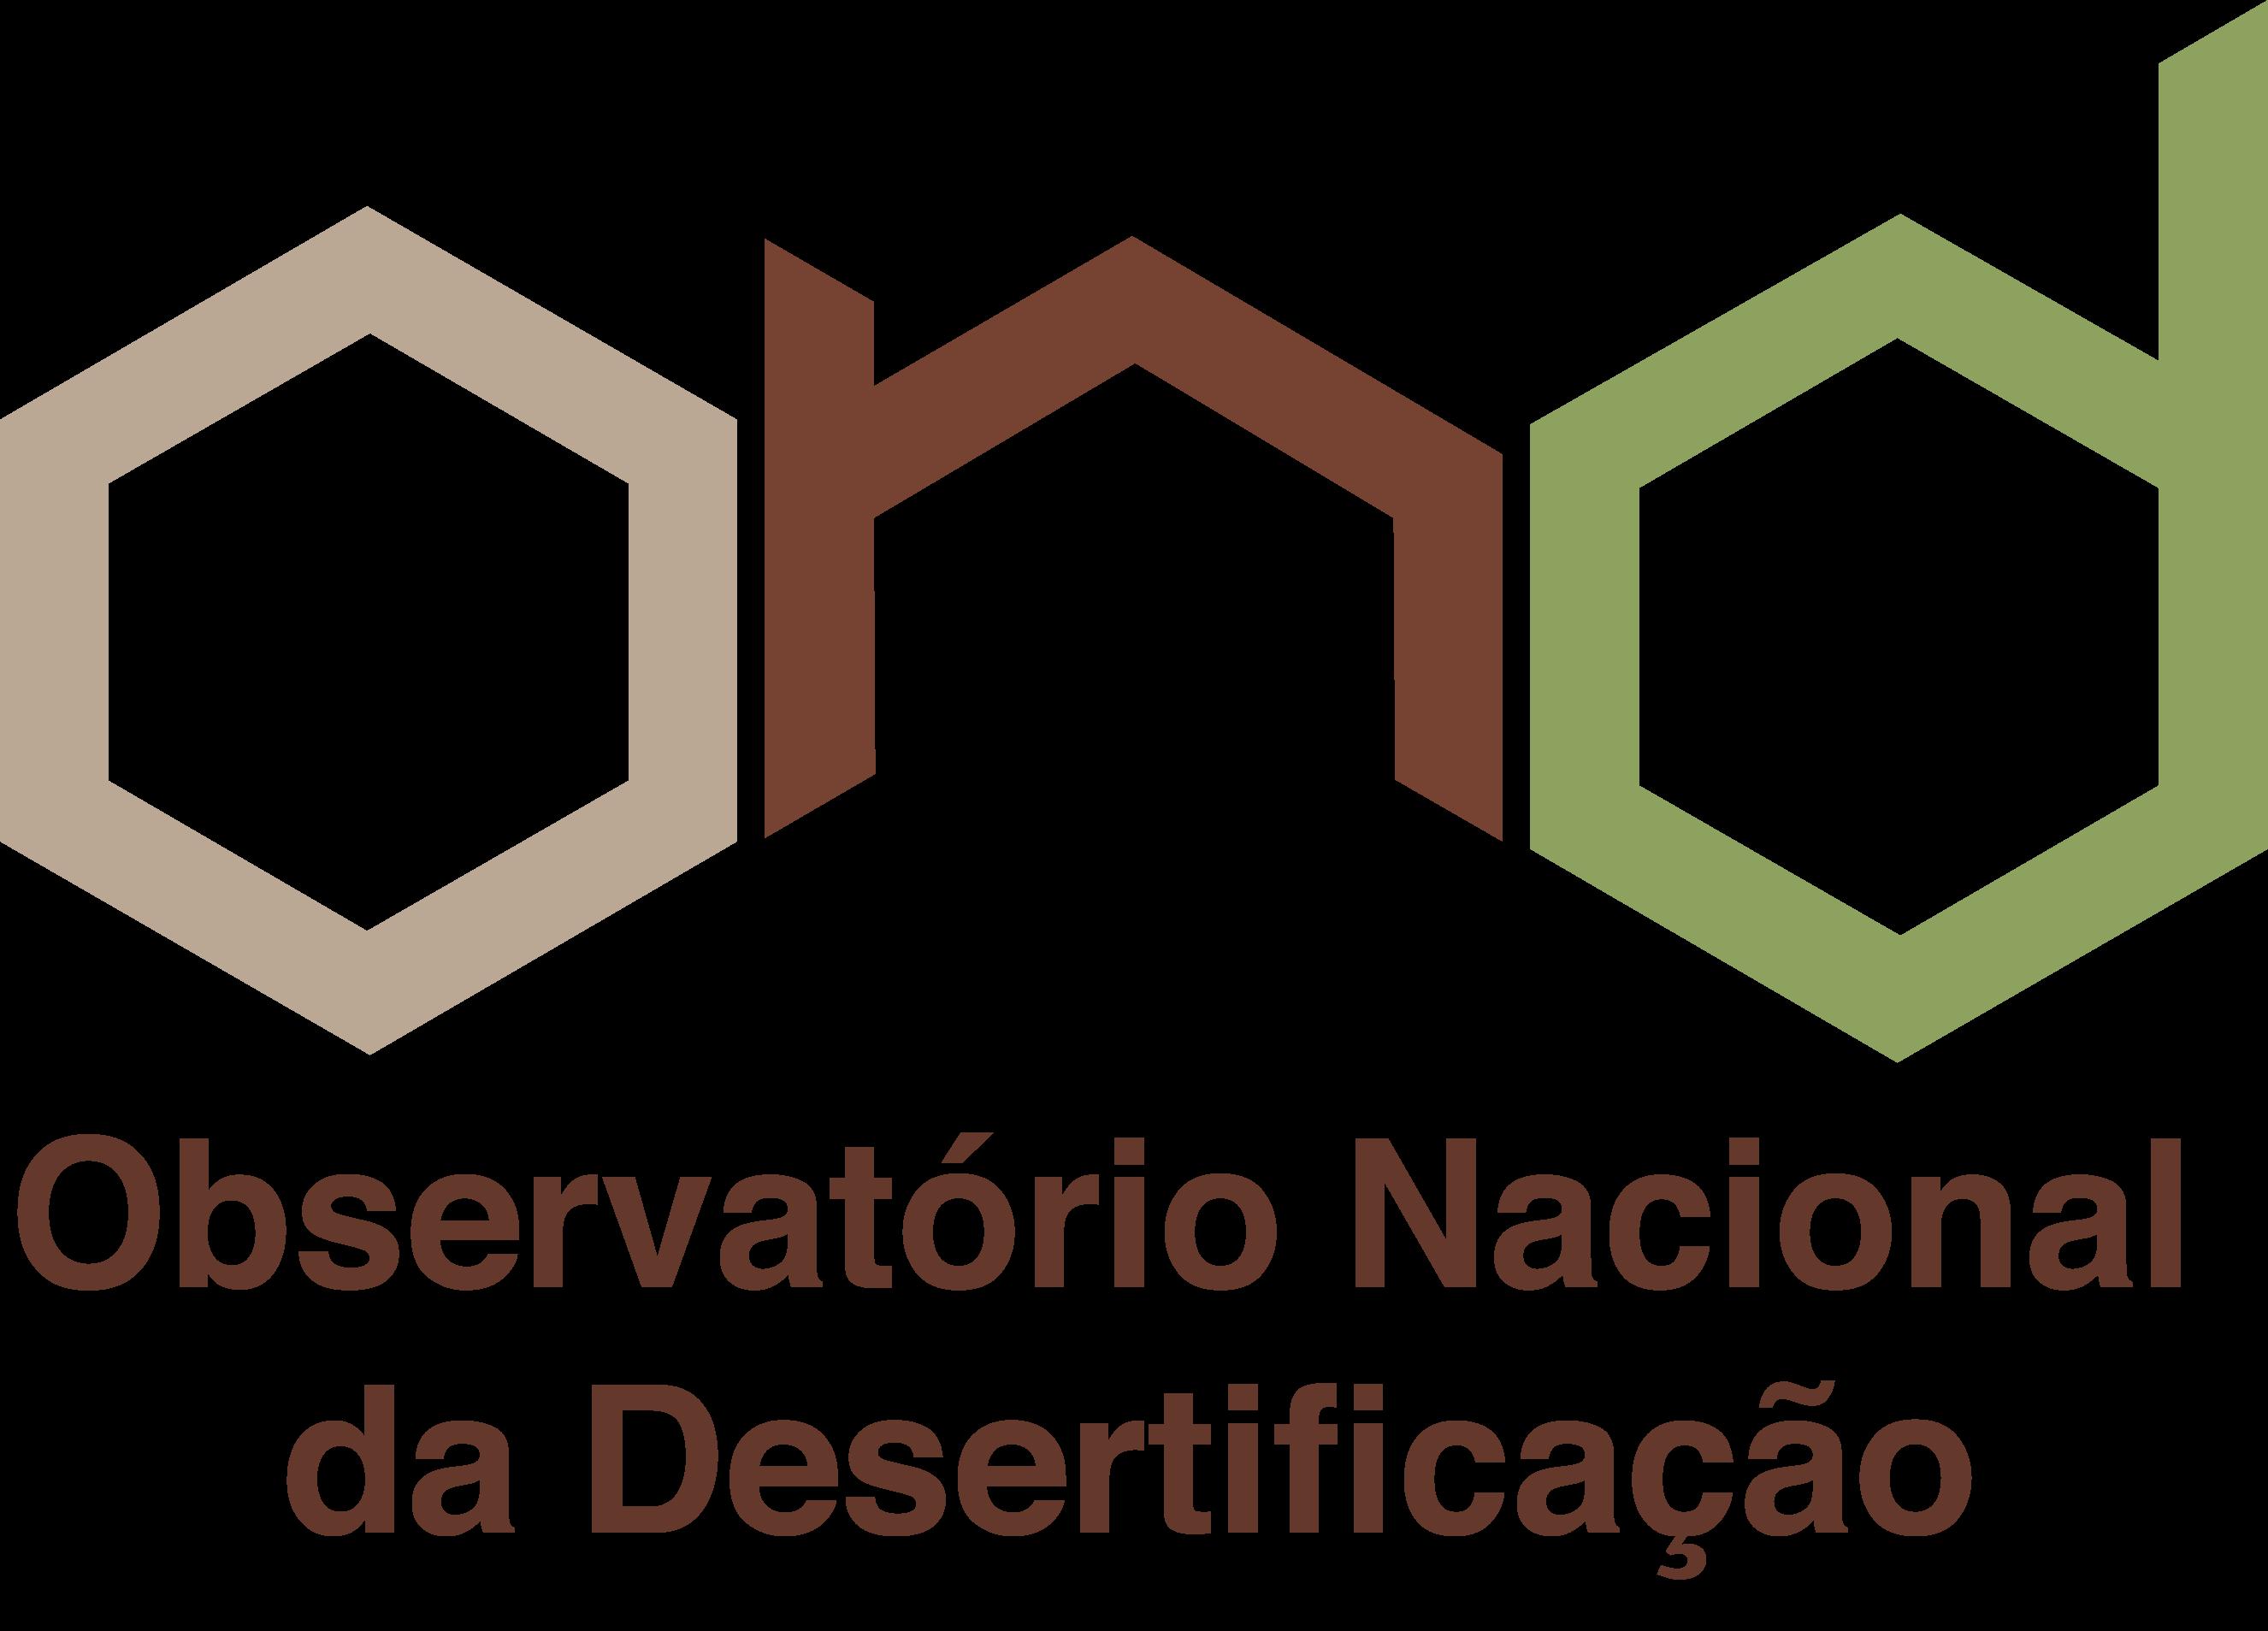 observatorio-nacional-de-desertificacao